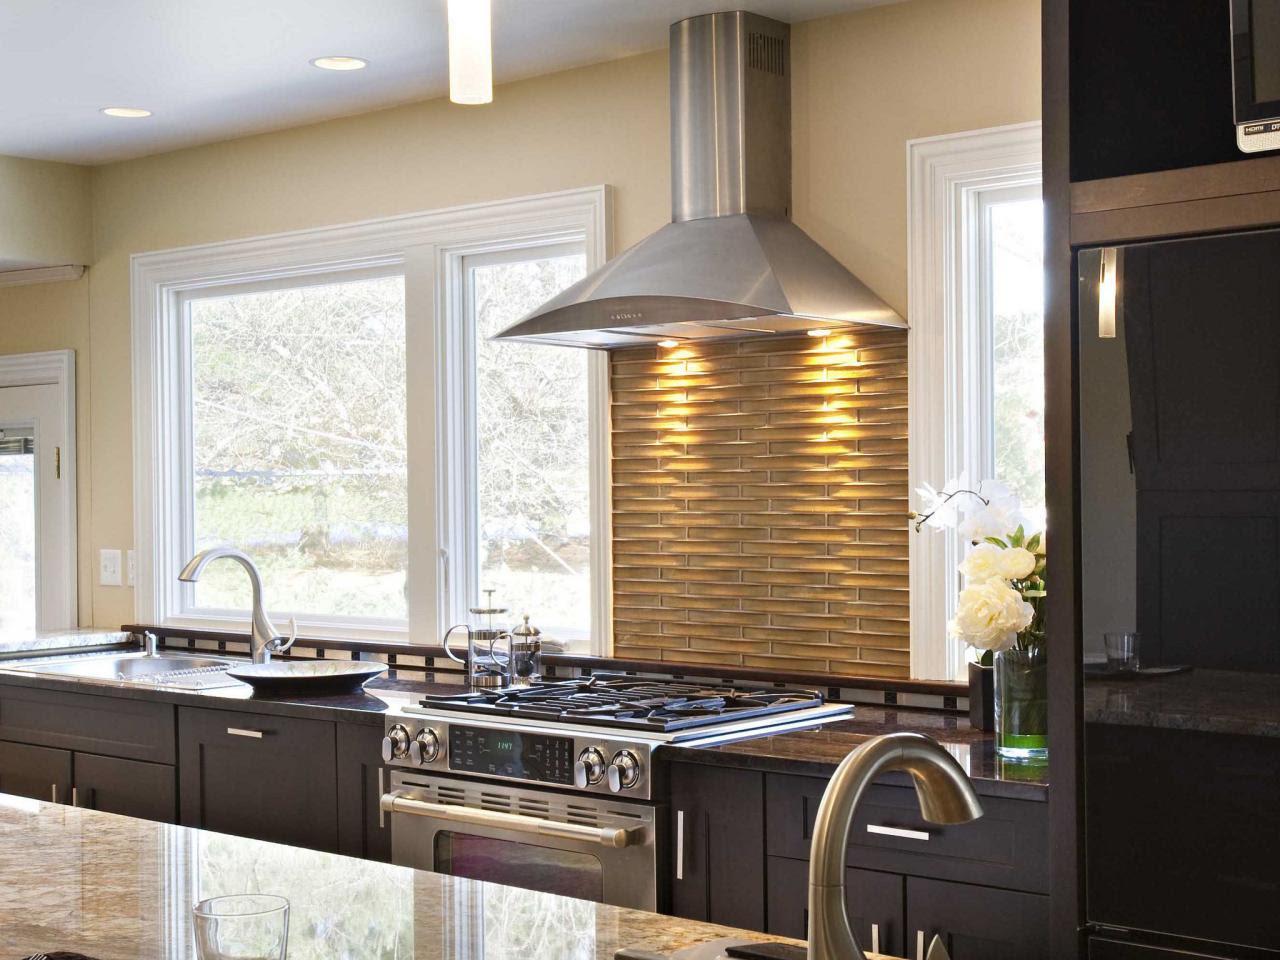 Kitchen Stove Backsplash Ideas: Pictures & Tips From HGTV ...